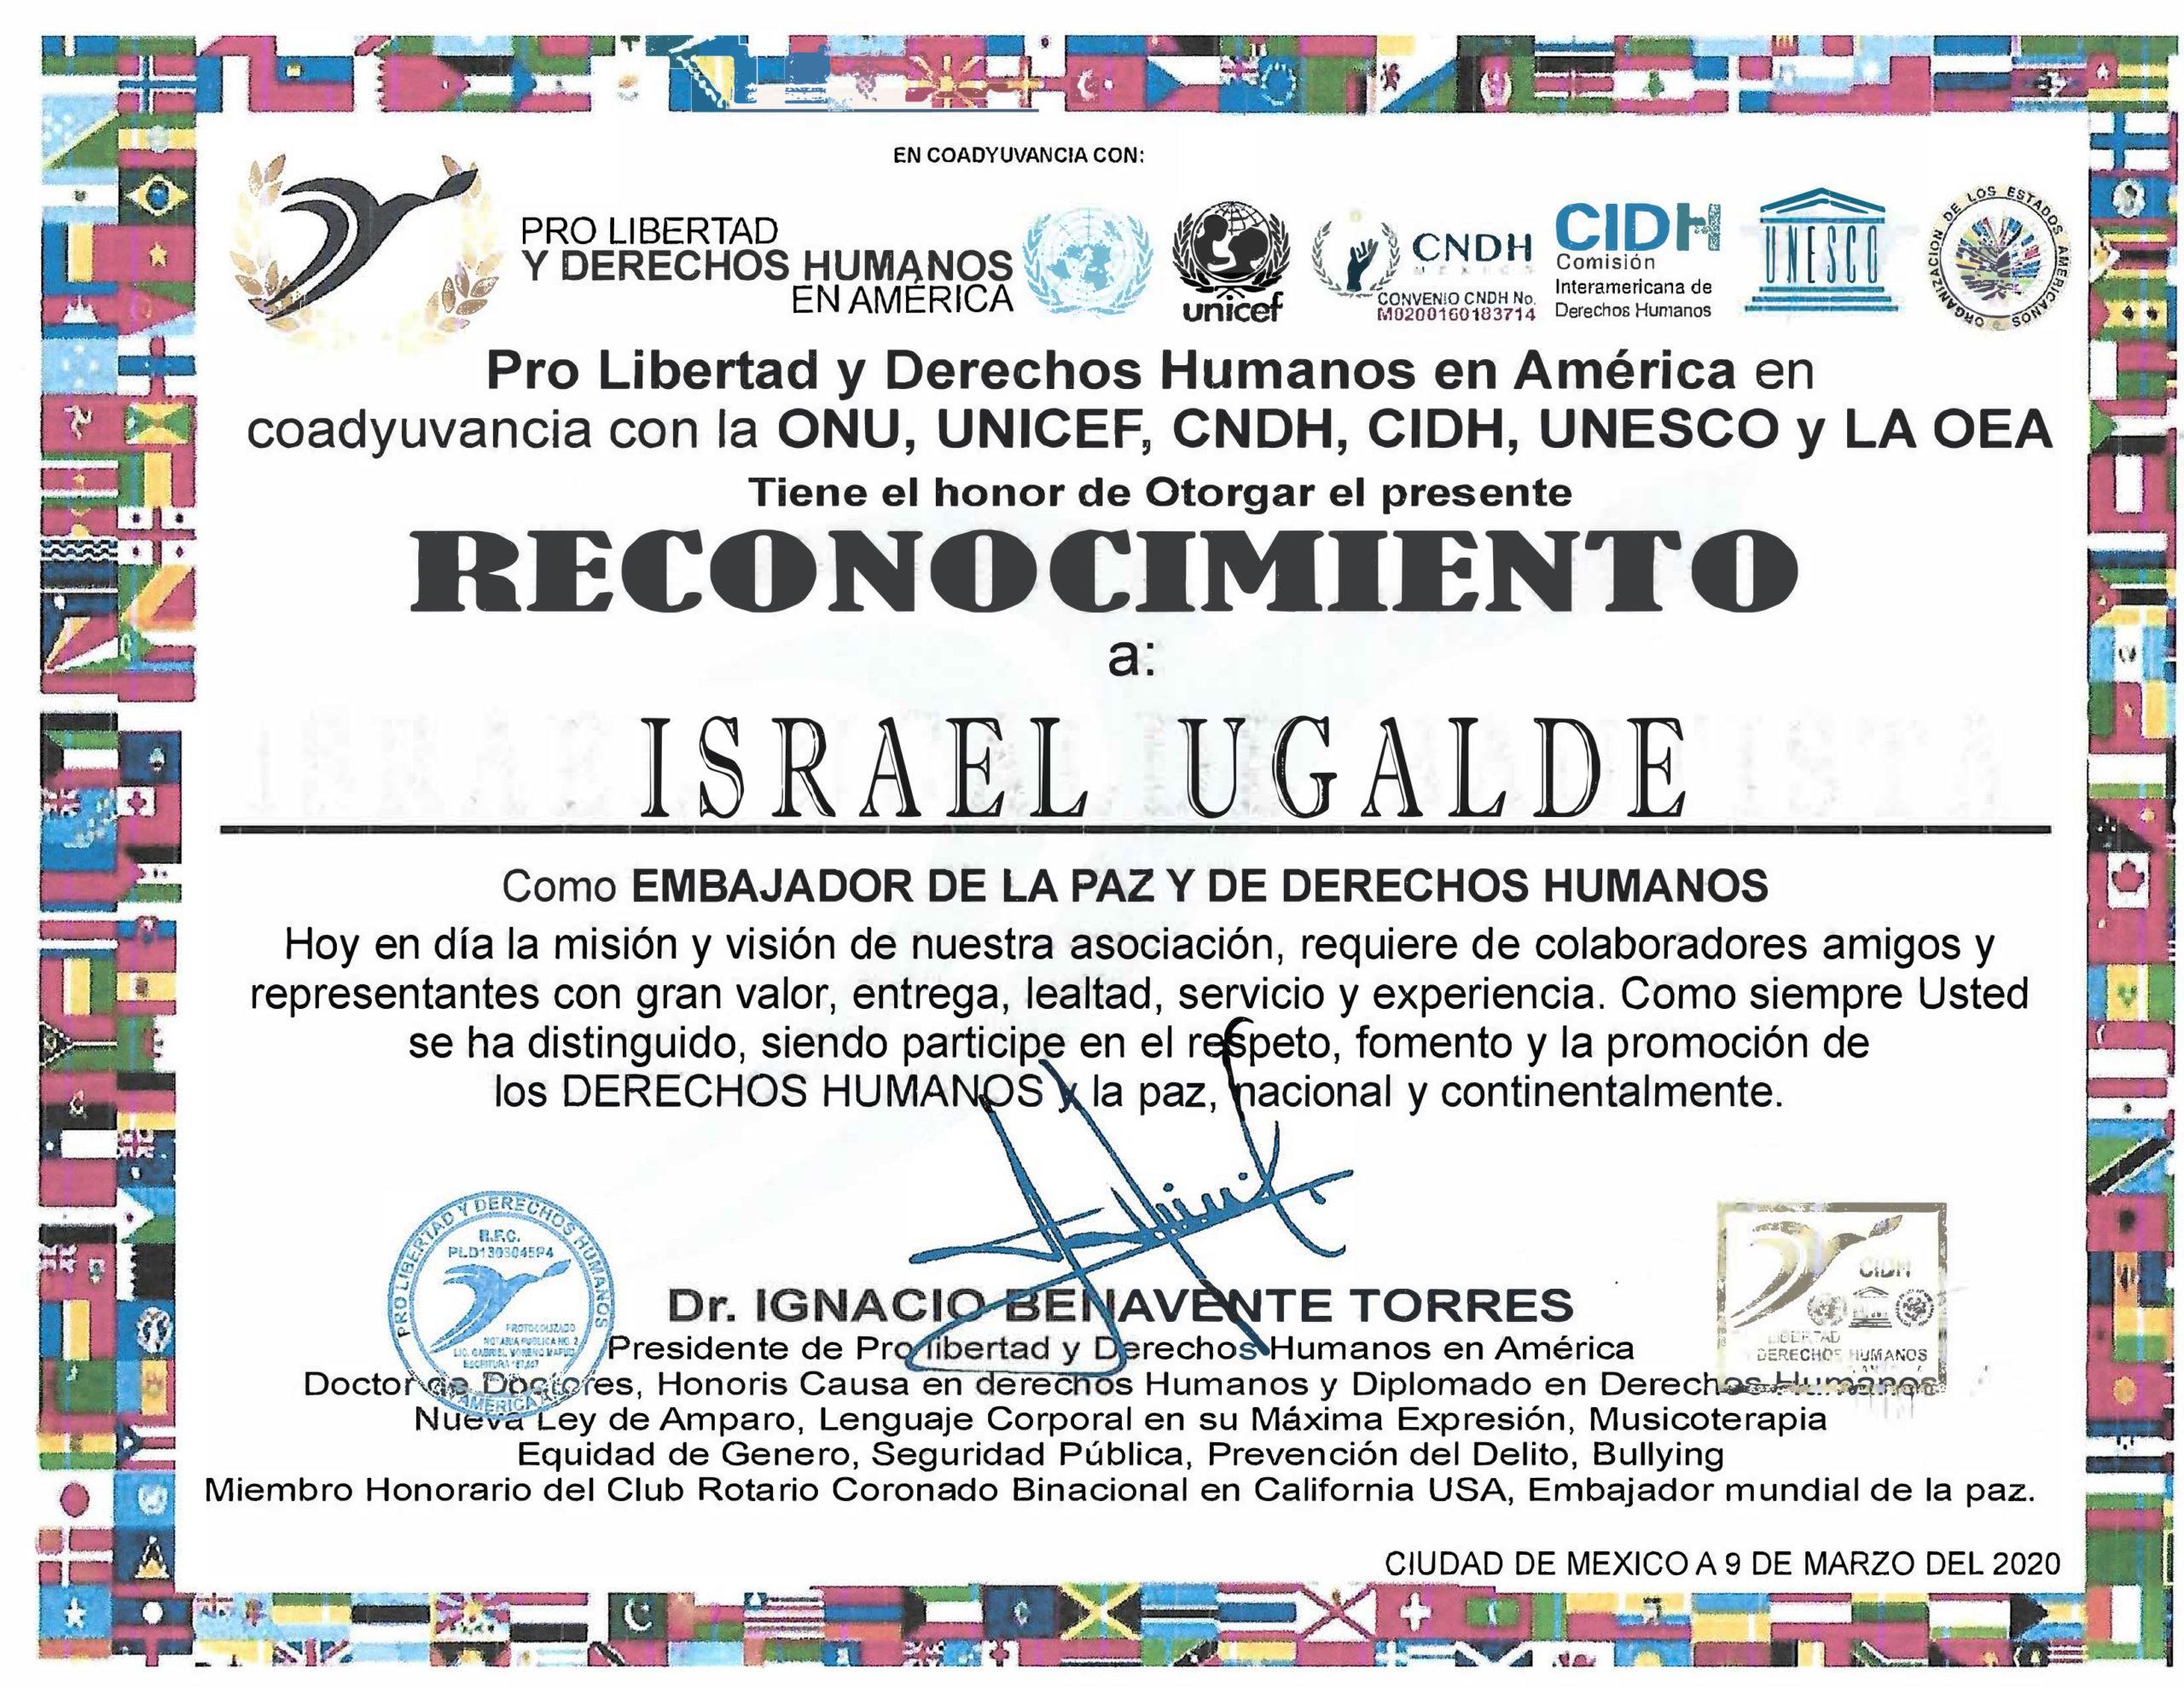 RECONOCIMIENTO-PRO-LIBERTAD-ISRAEL-UGALDE-1-scaled-2.jpg